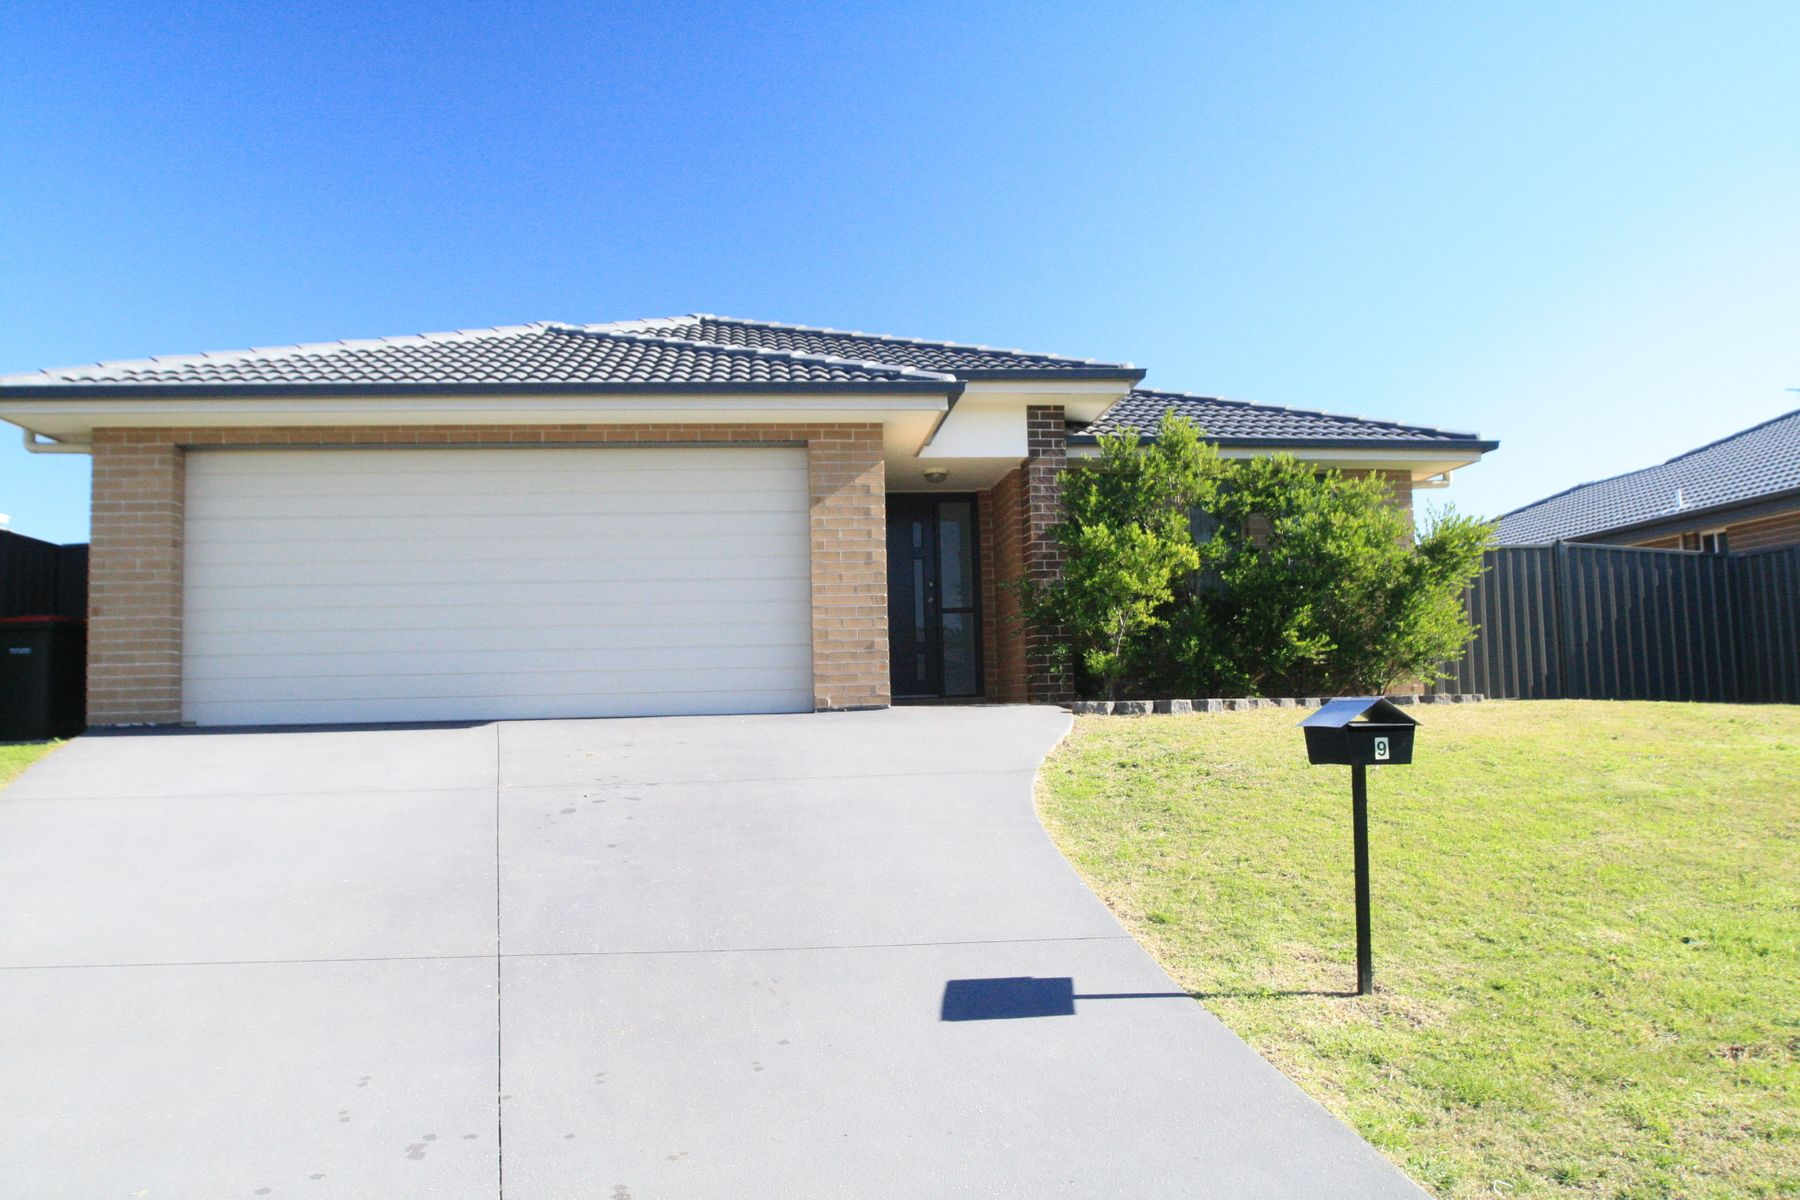 9 Hepburn Close, Rutherford, NSW 2320